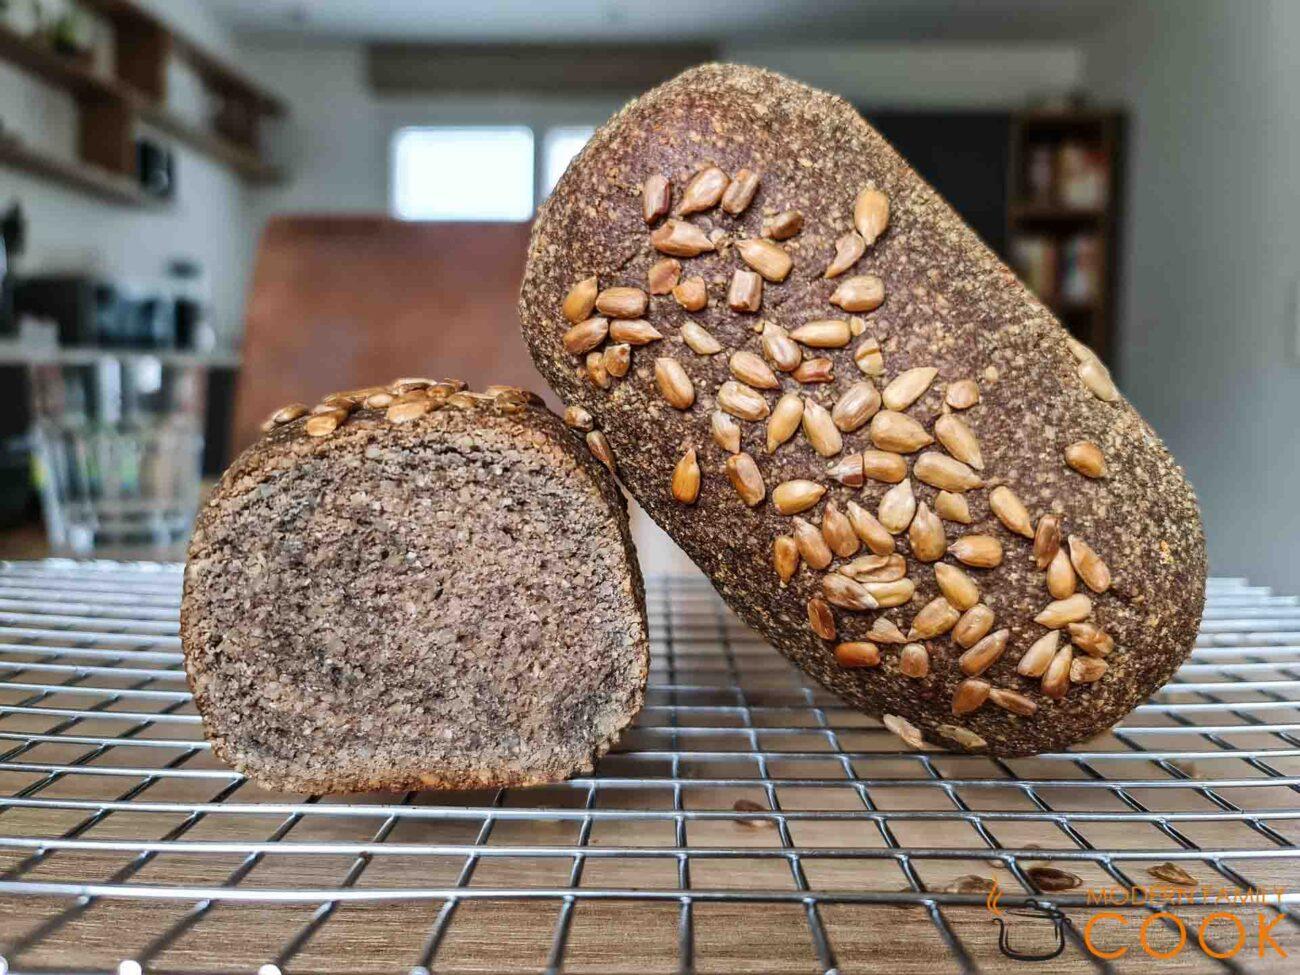 Хлеб из семян подсолнечника (gluten-free, dairy-free, egg-free)